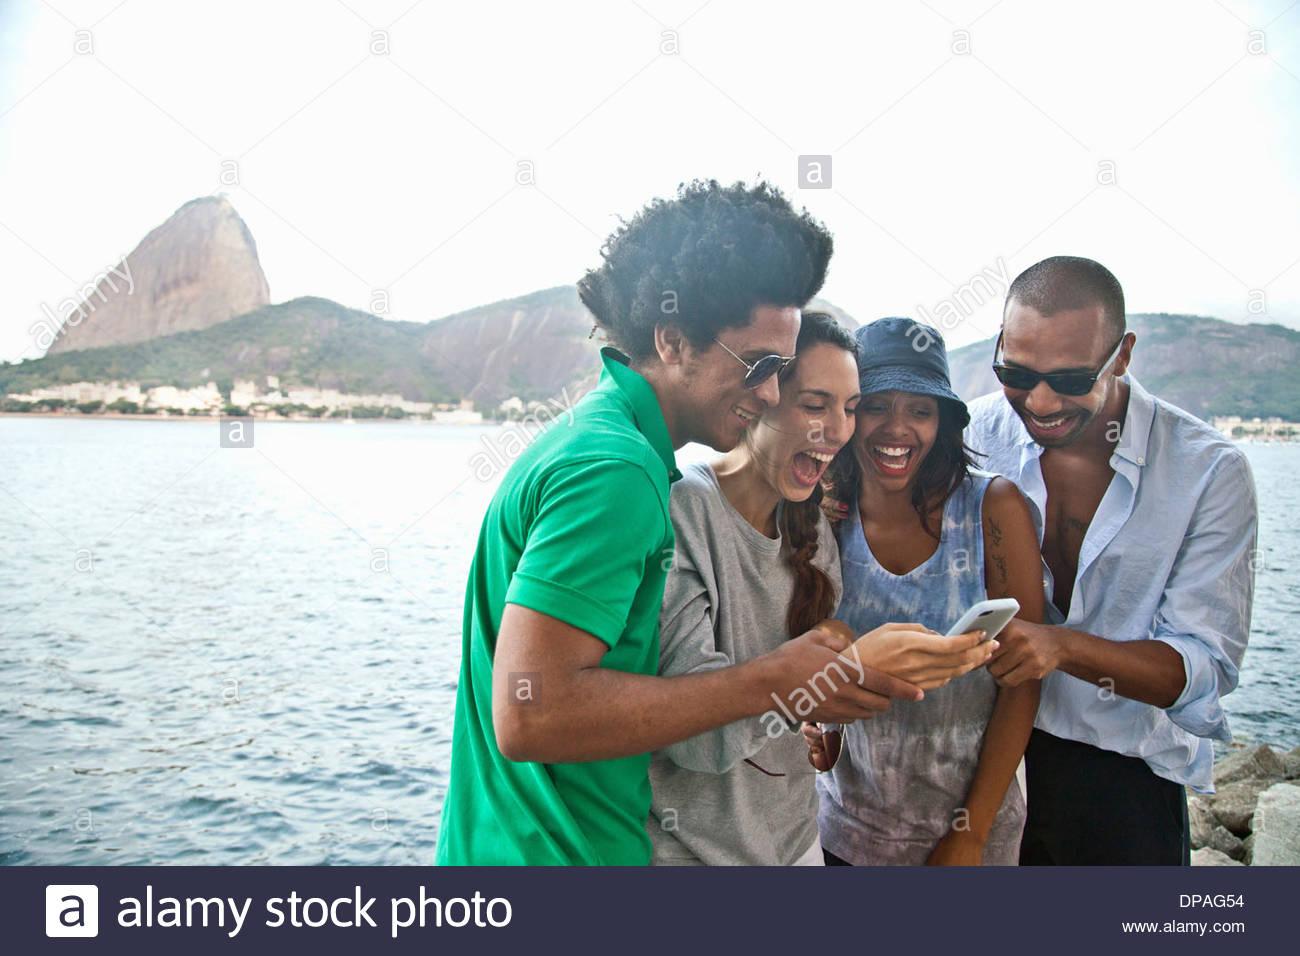 Four friends looking at smartphone, Rio de Janeiro, Brazil - Stock Image